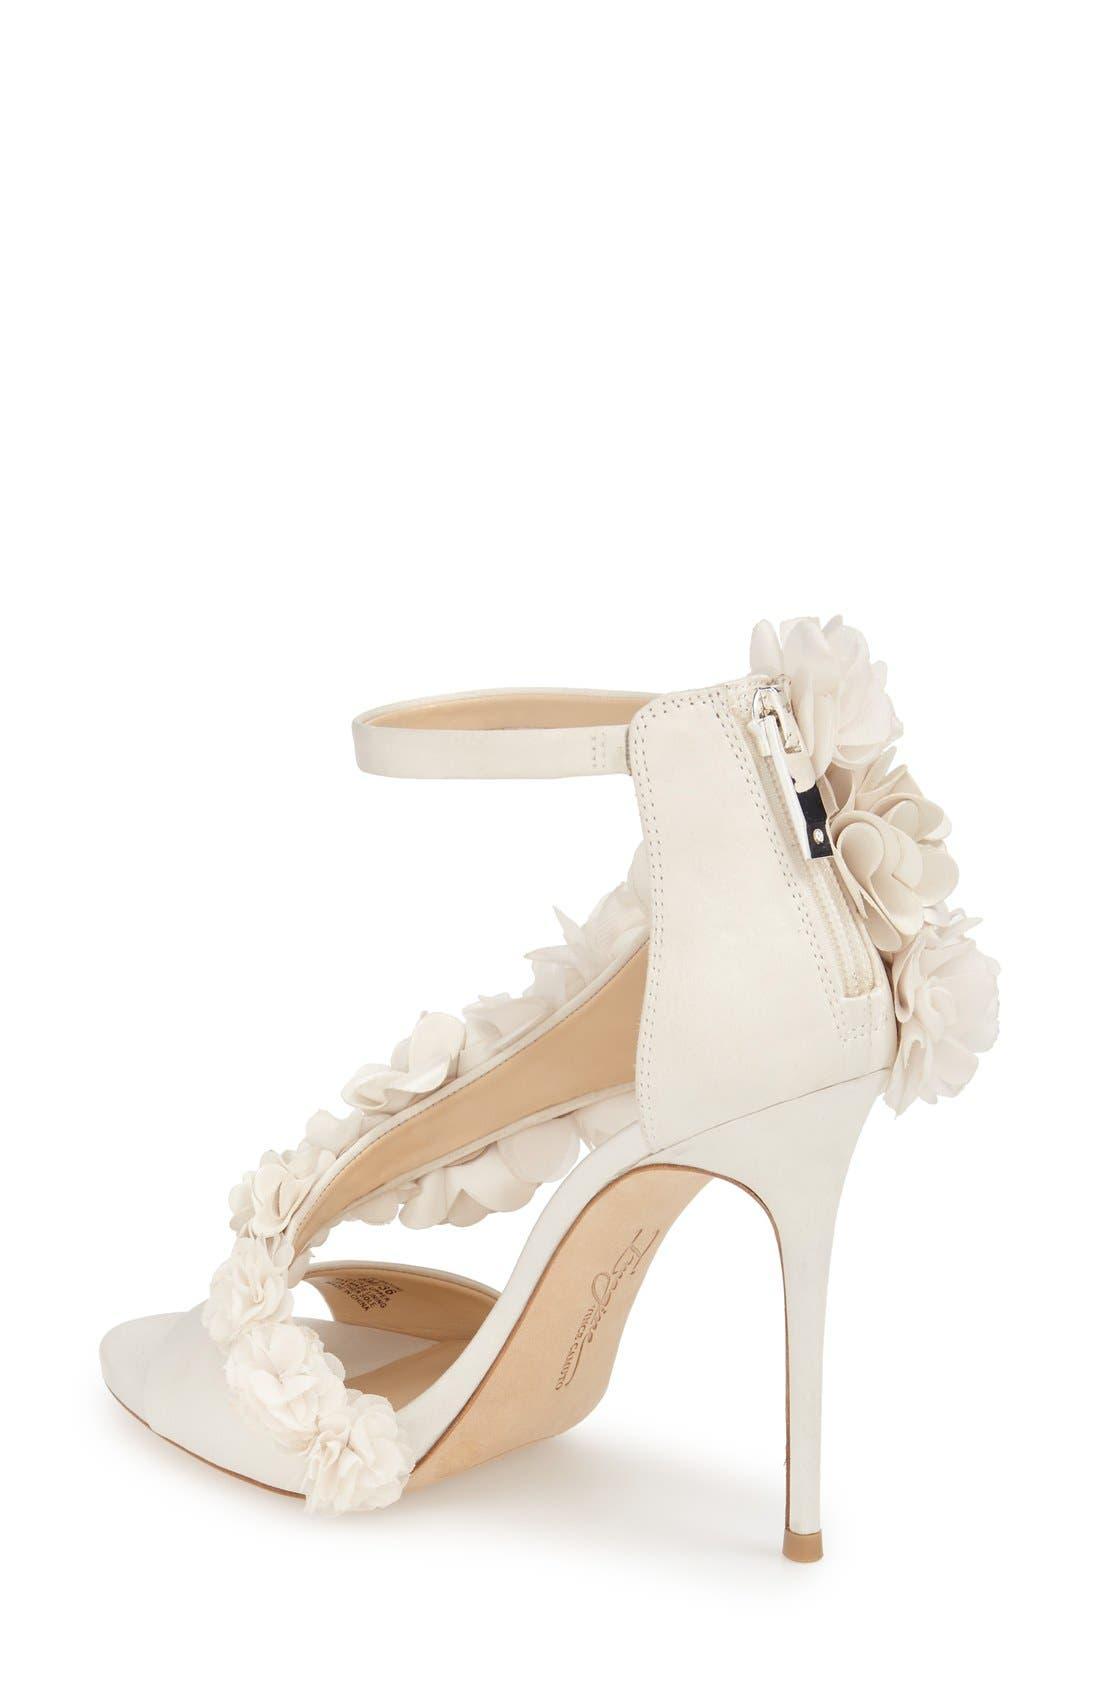 Alternate Image 2  - Imagine by Vince Camuto 'Daphne' Floral Ankle Strap Sandal (Women)